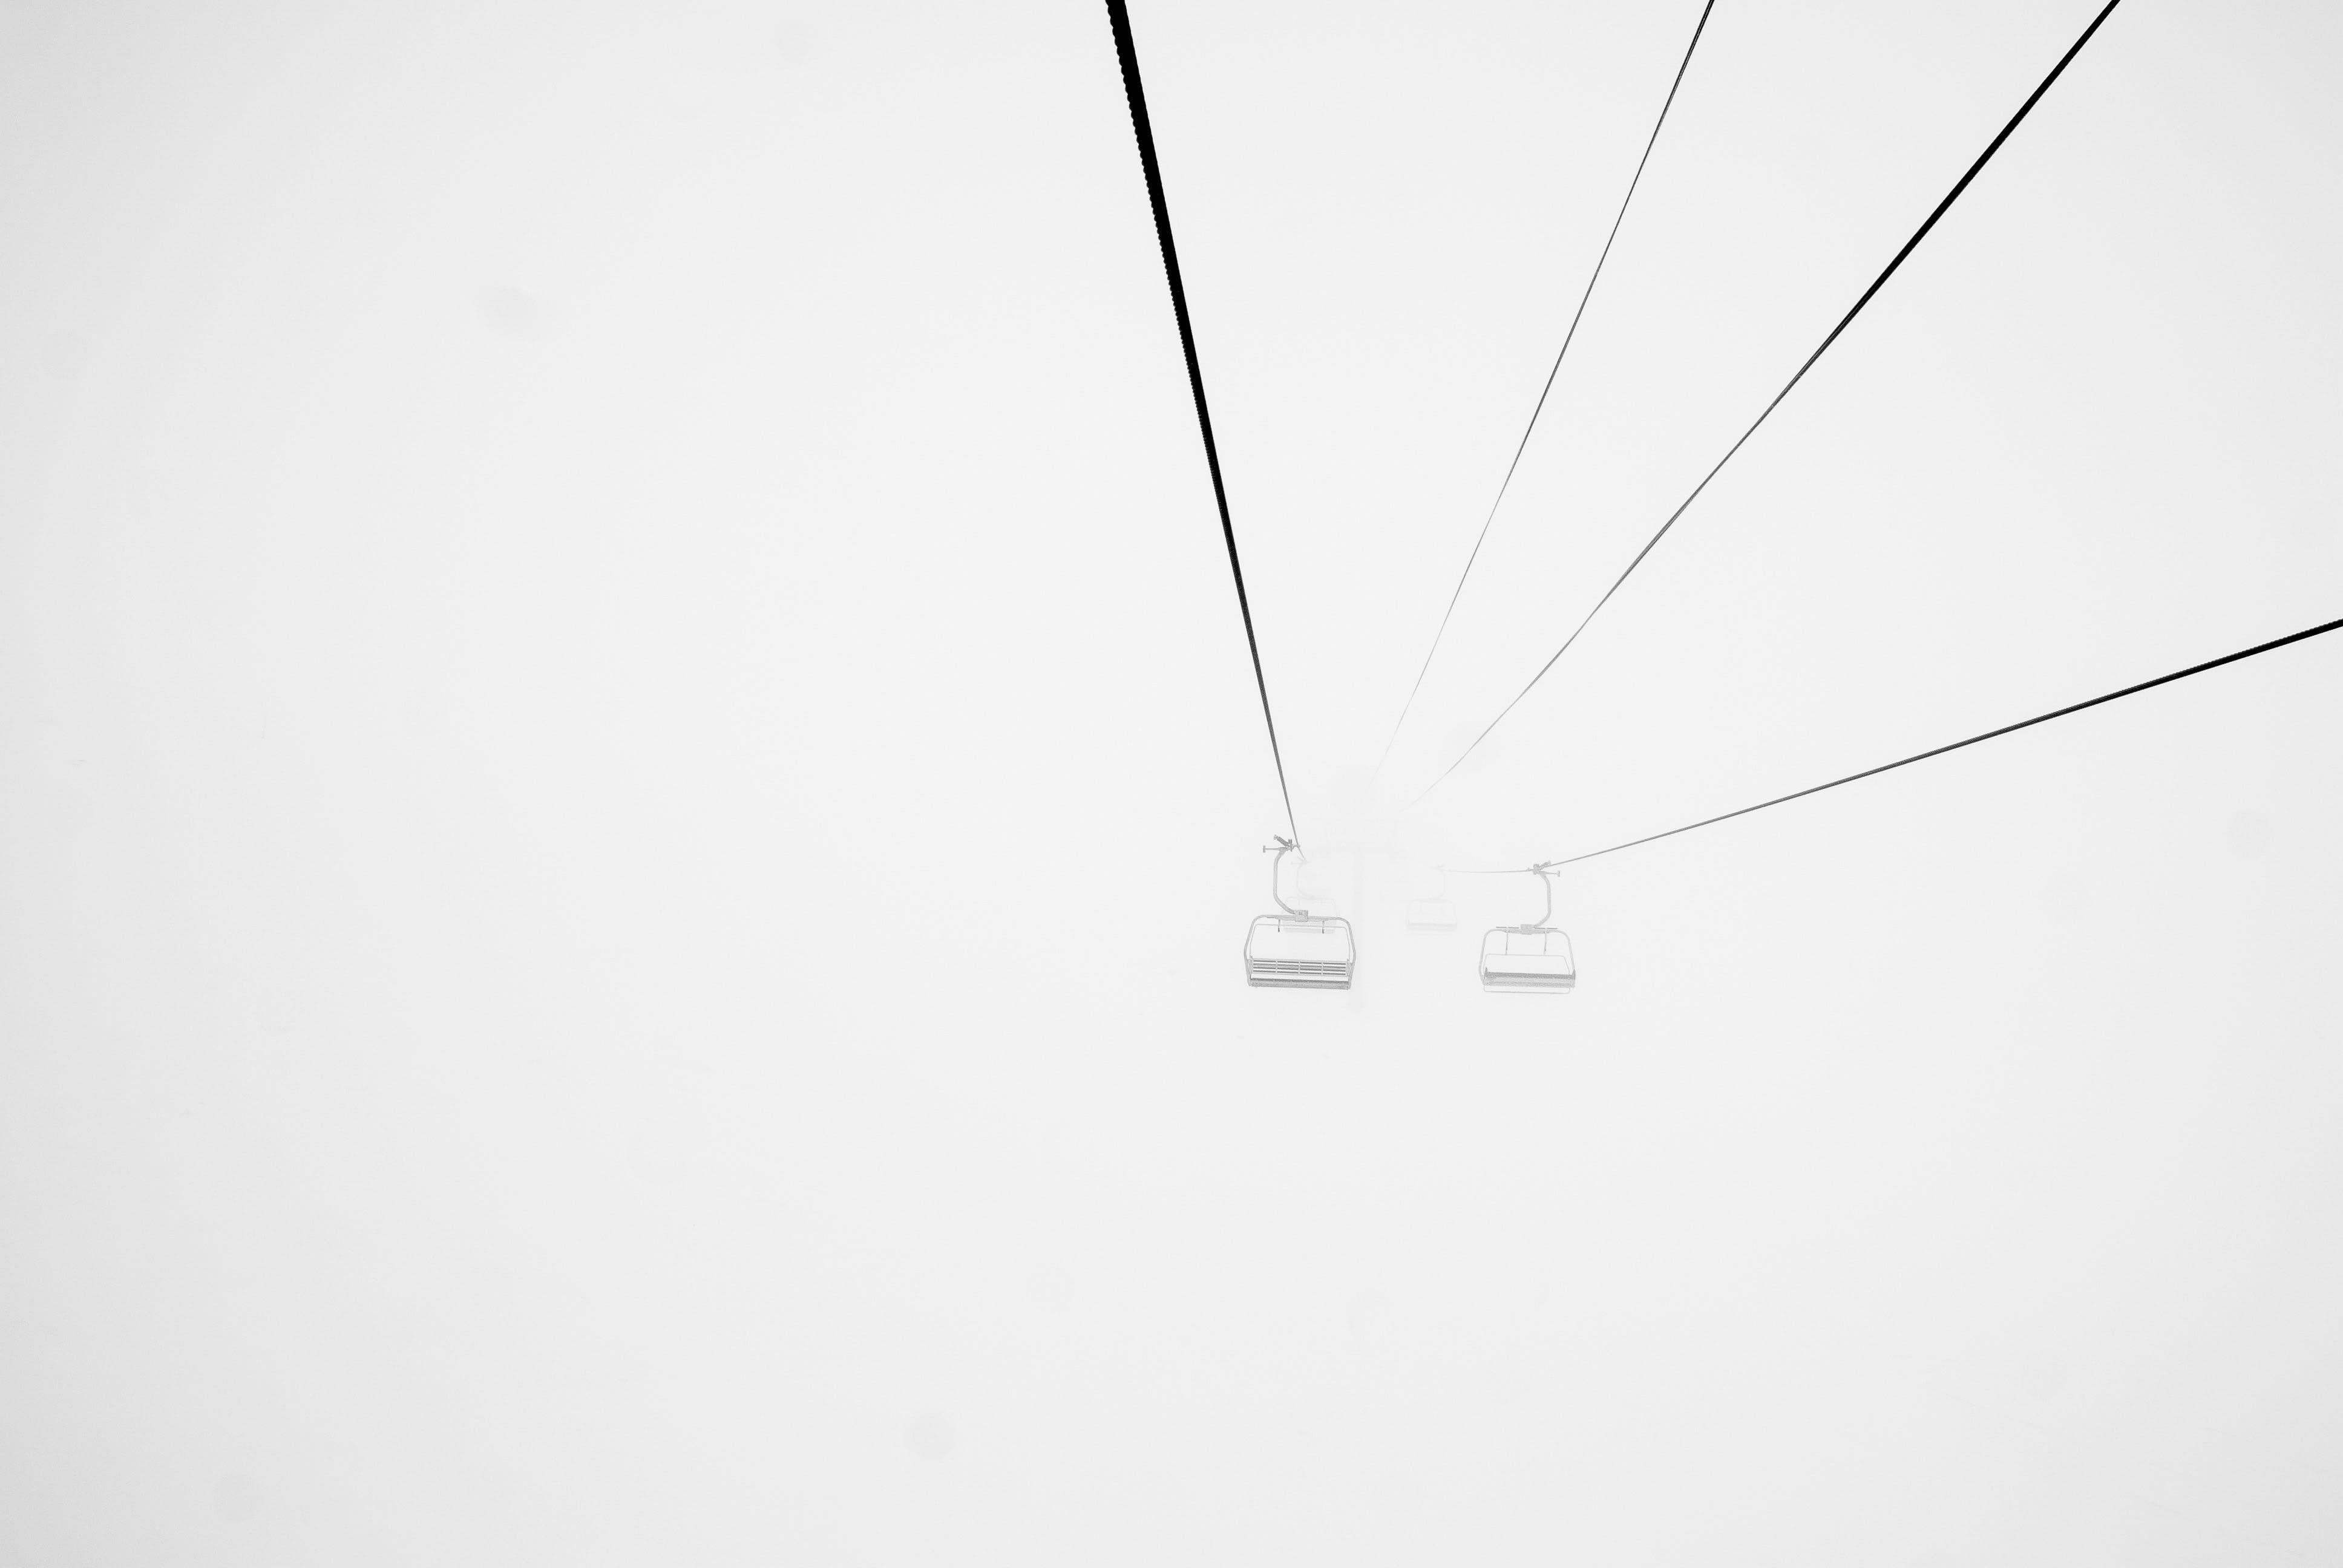 cable car, cable railway, fog